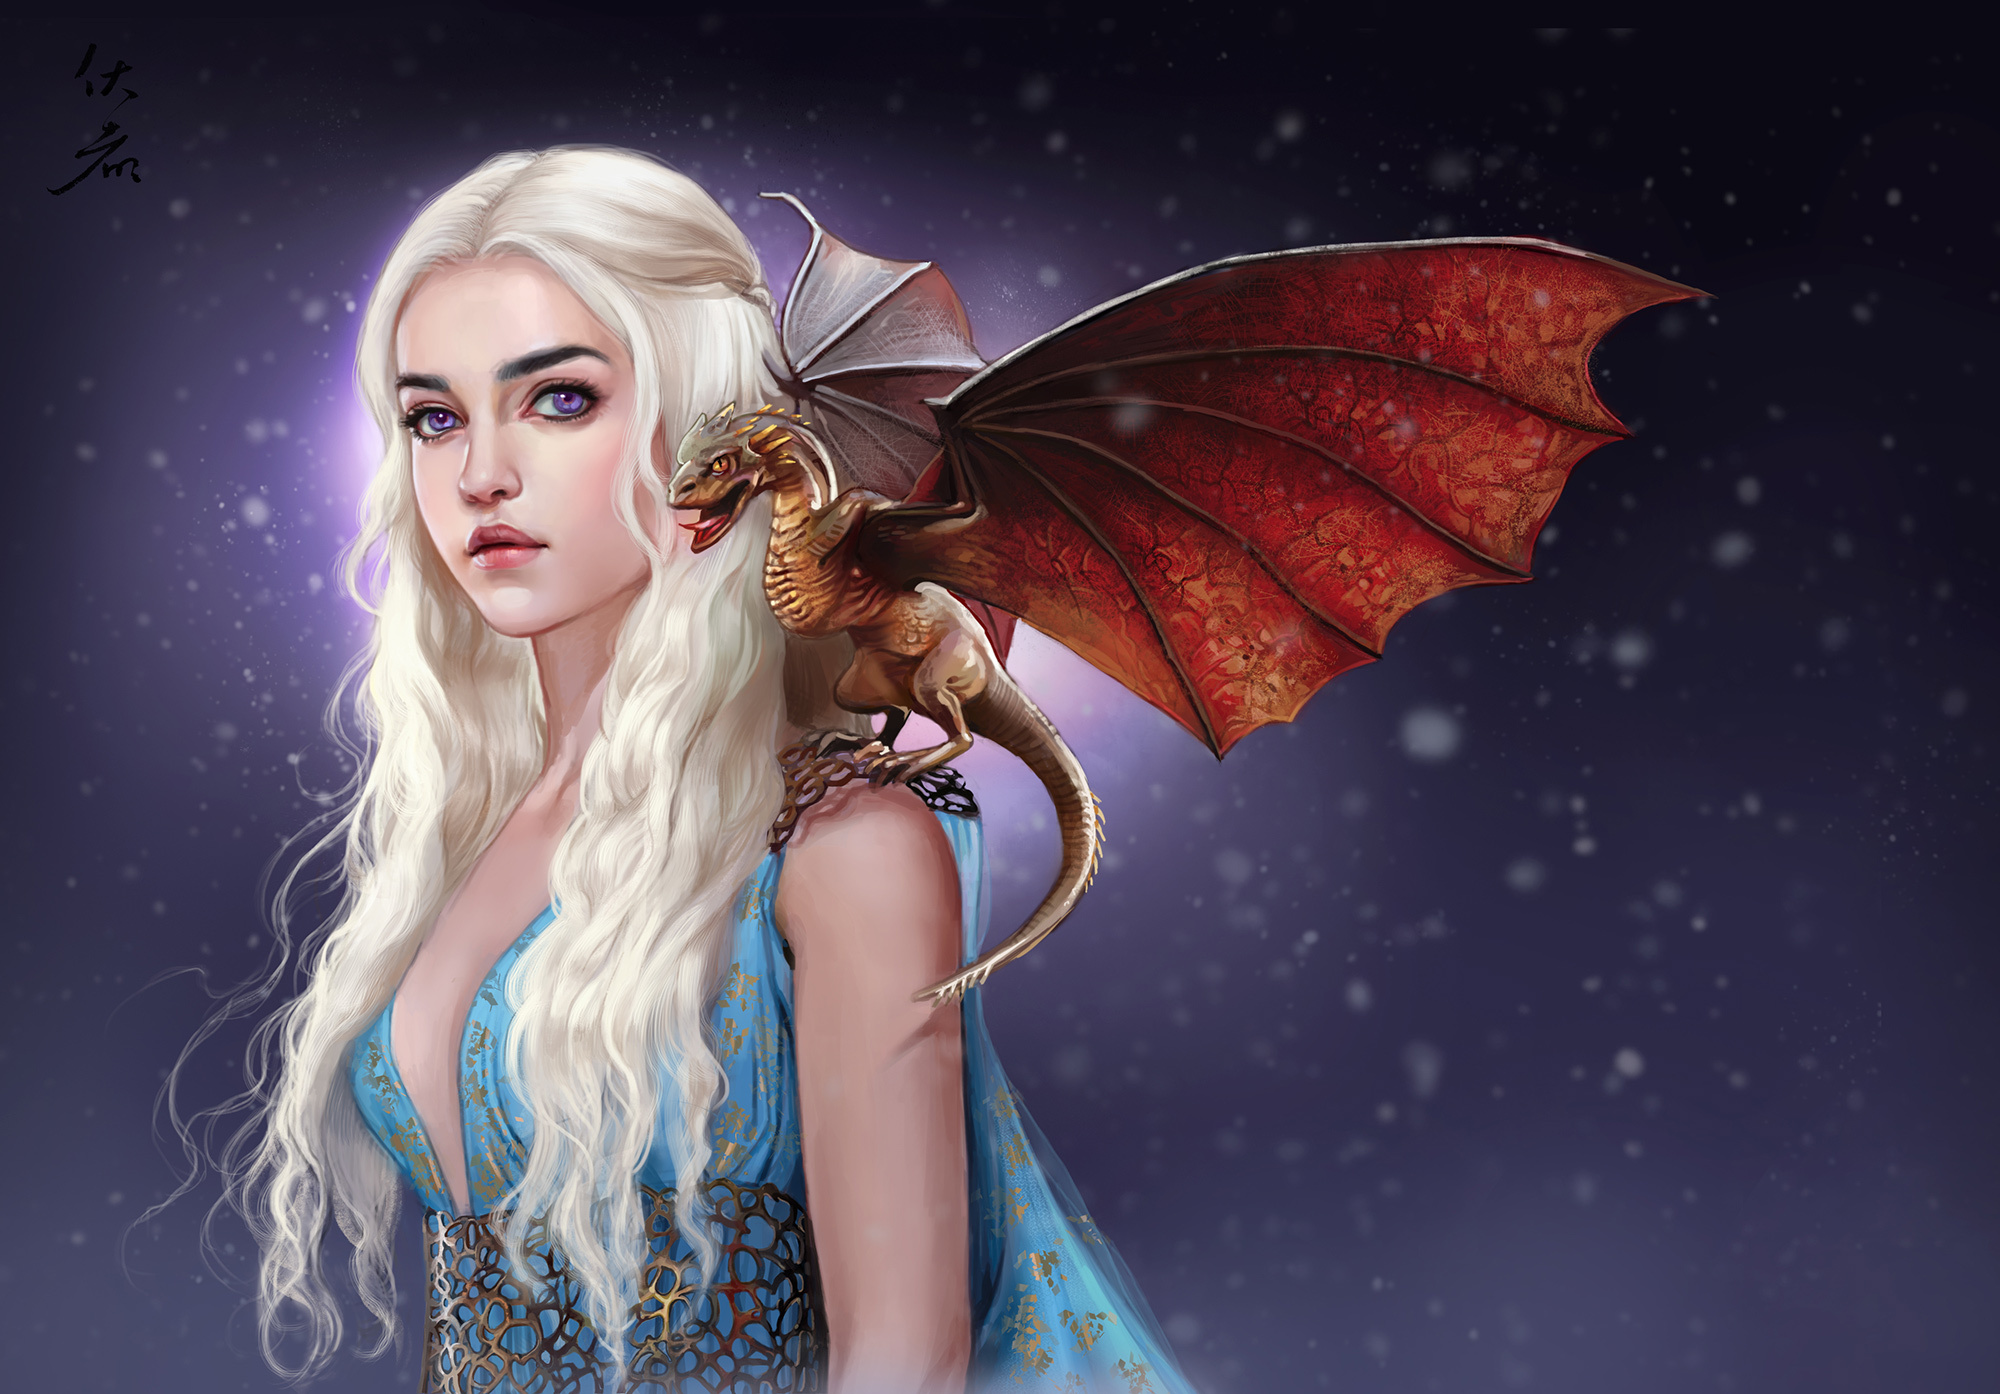 Khaleesi: Mother Of Dragons Full HD Wallpaper And